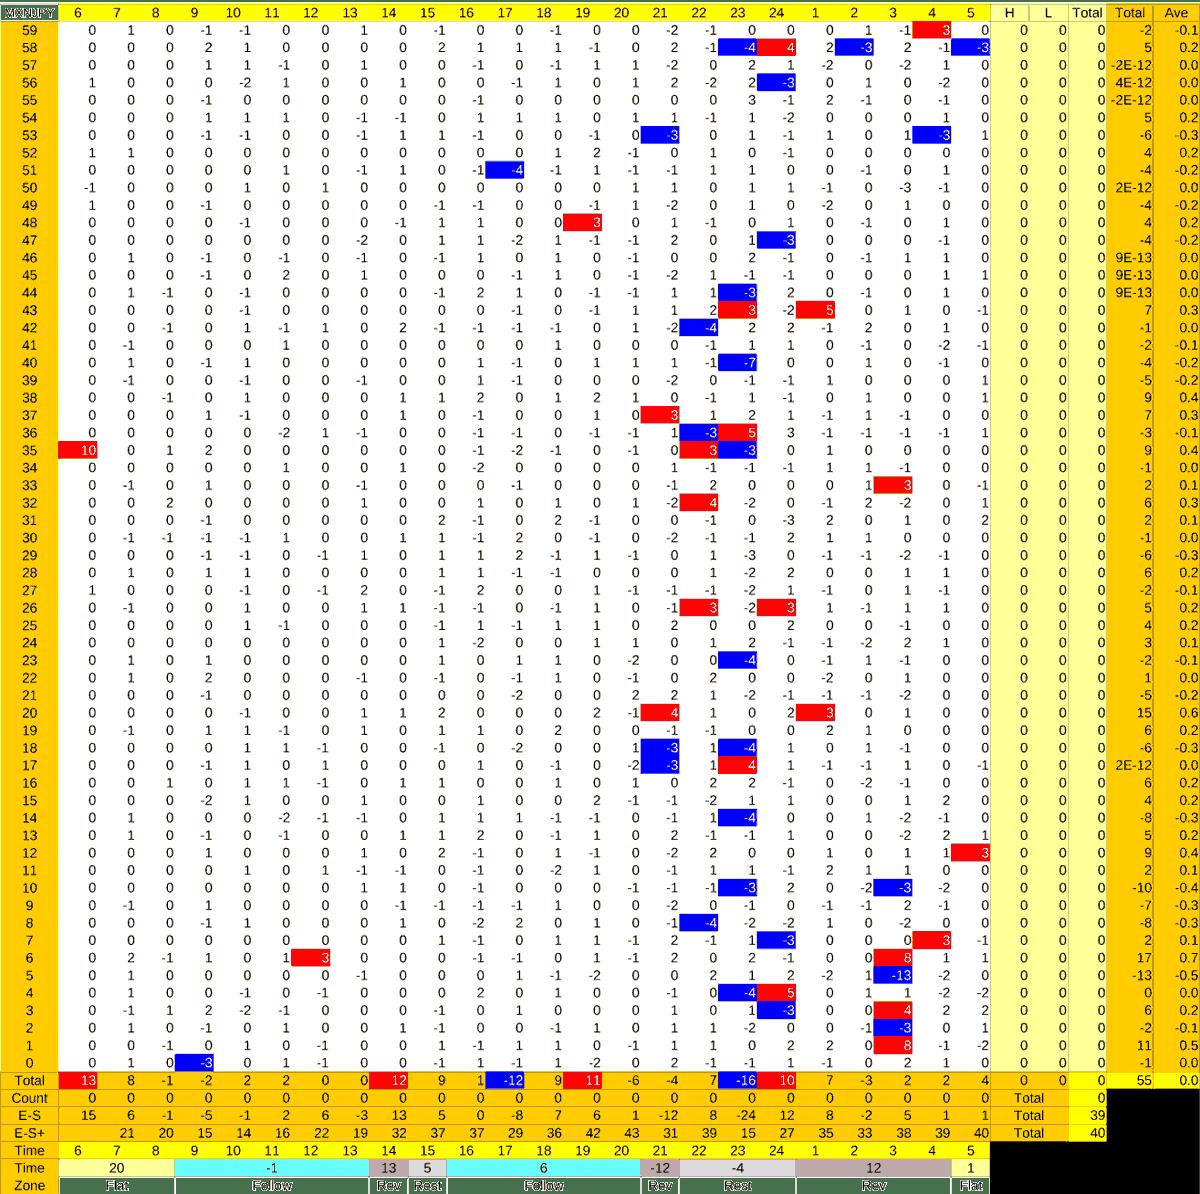 20210707_HS(3)MXNJPY